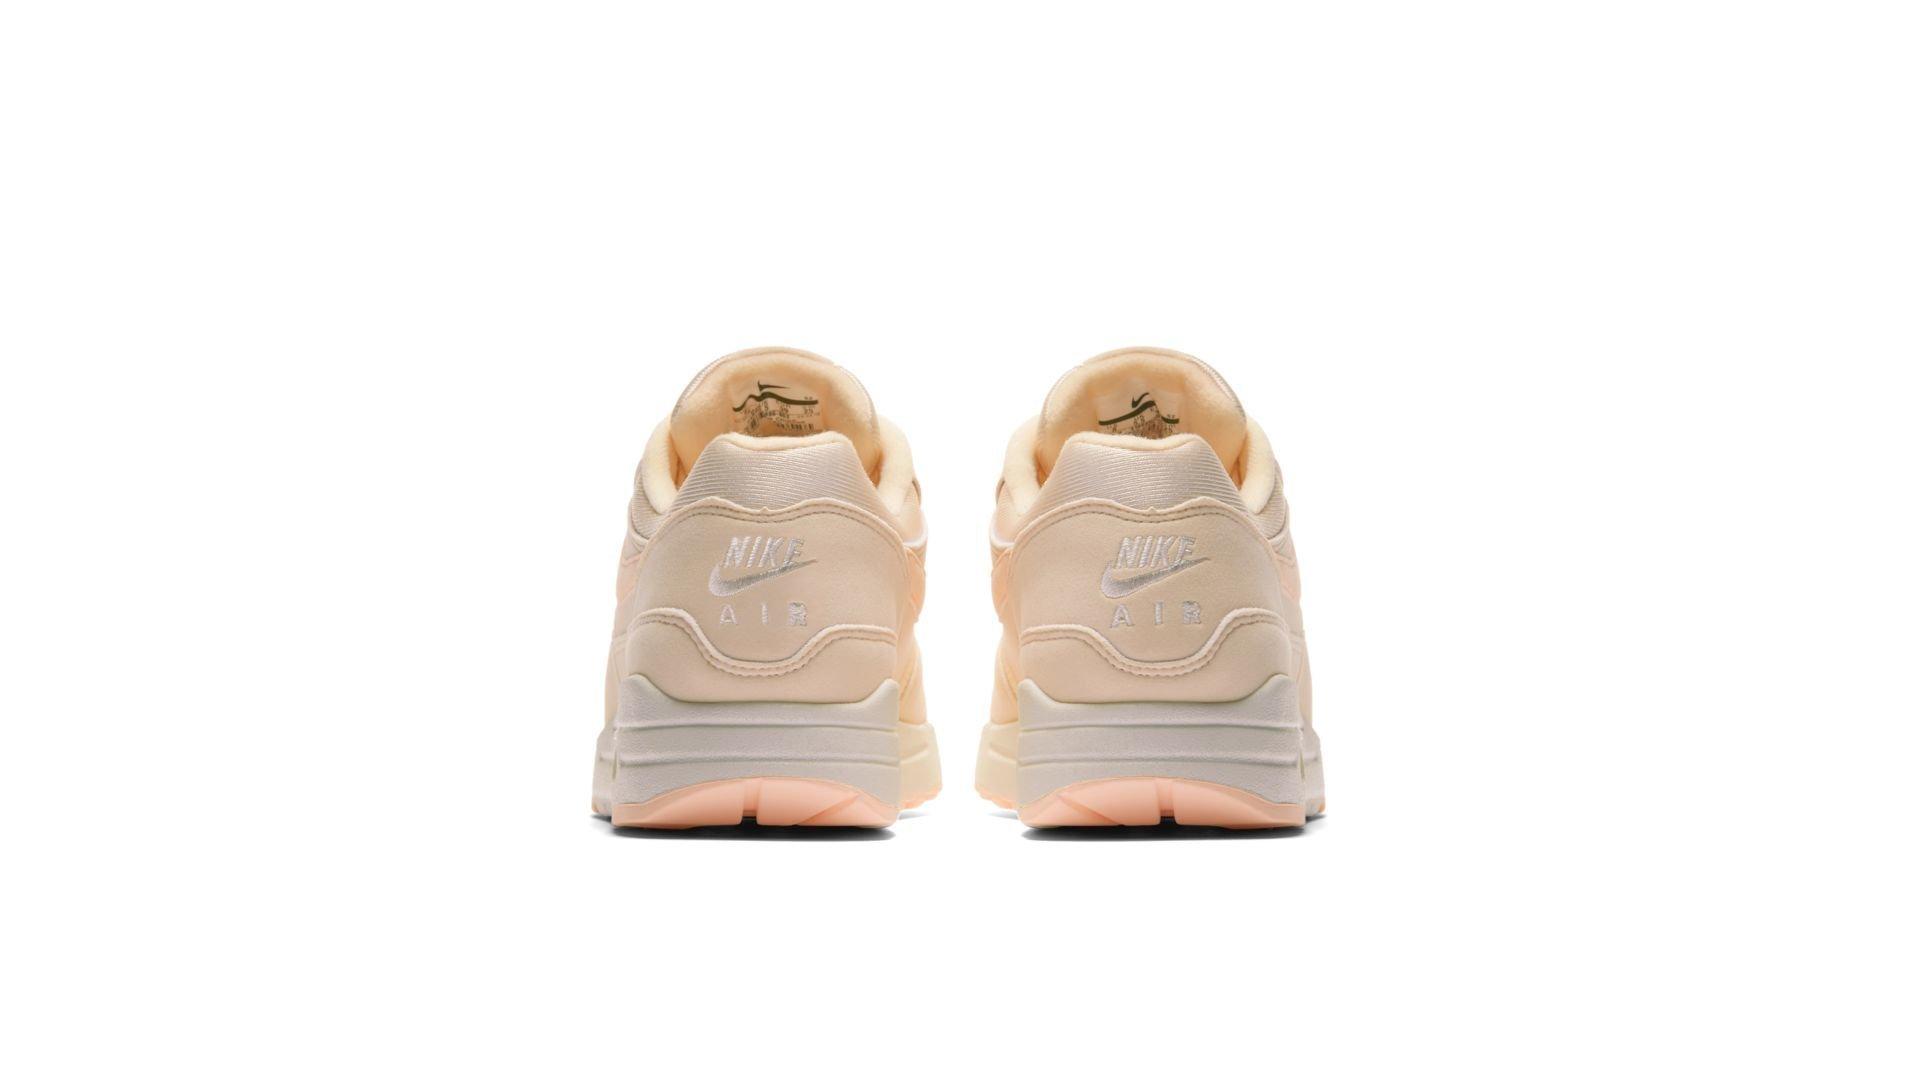 Nike Wmns Air Max 1 'Guava Ice' (319986-802)